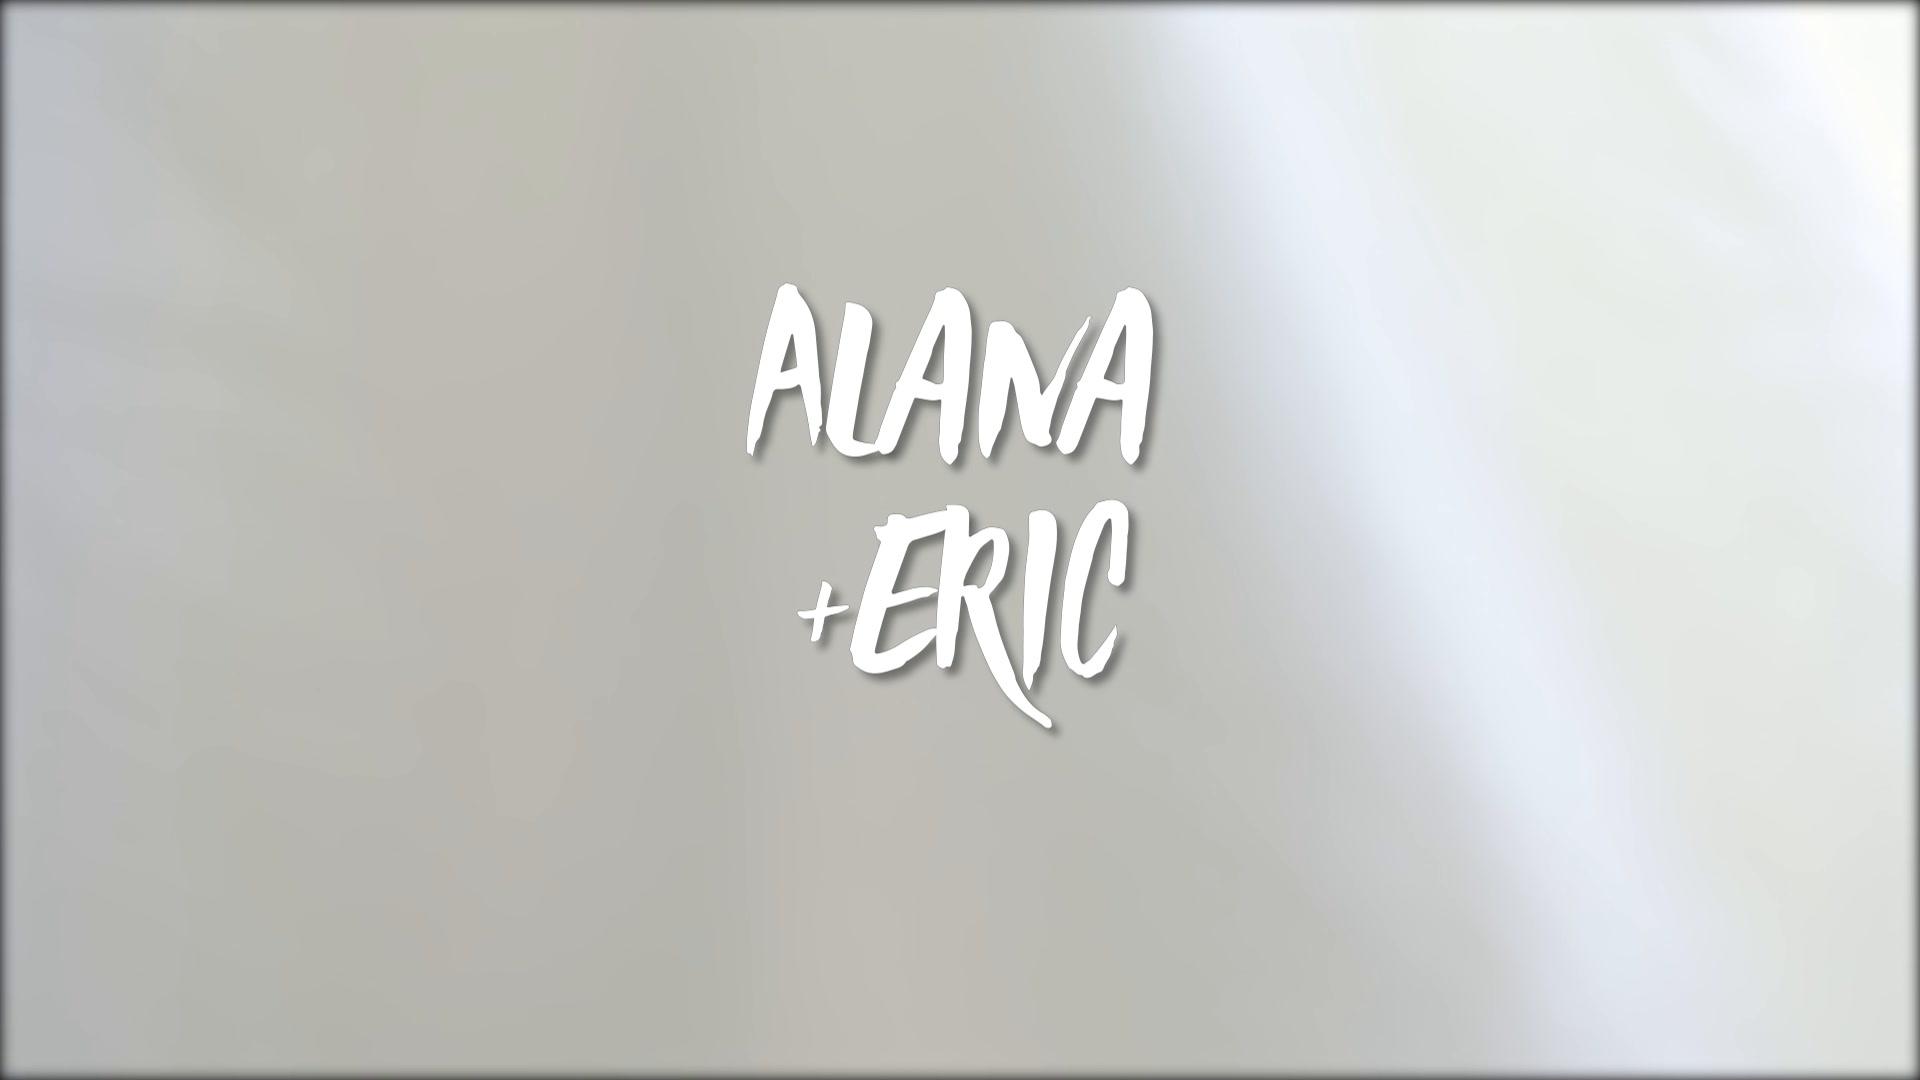 Alana + Eric | New York, New York | Harding's Restaurant